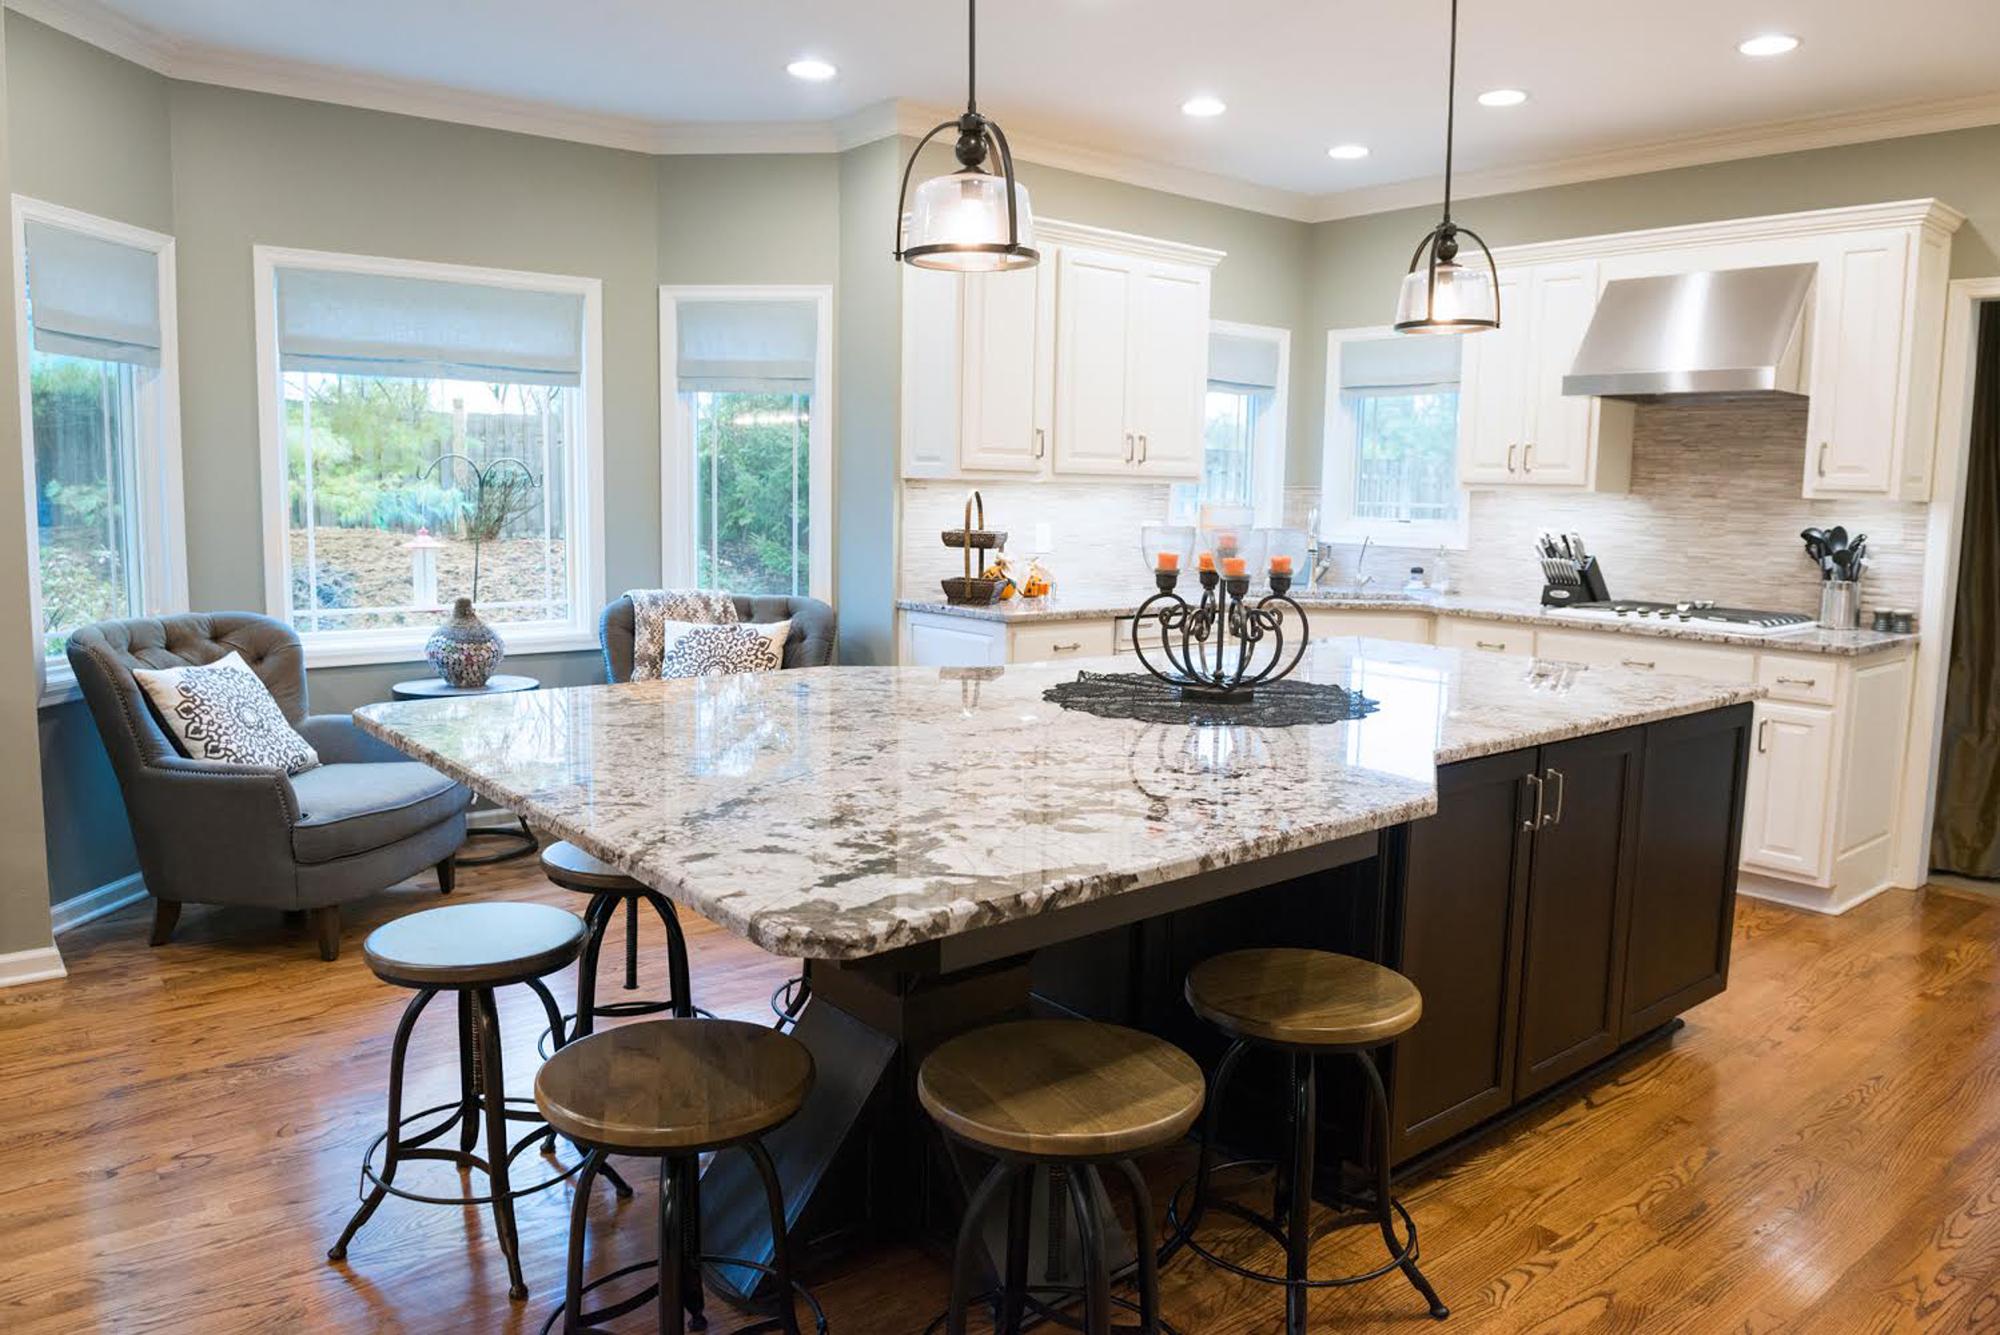 Column: Cabinet modifications, warm colors transform a kitchen ...